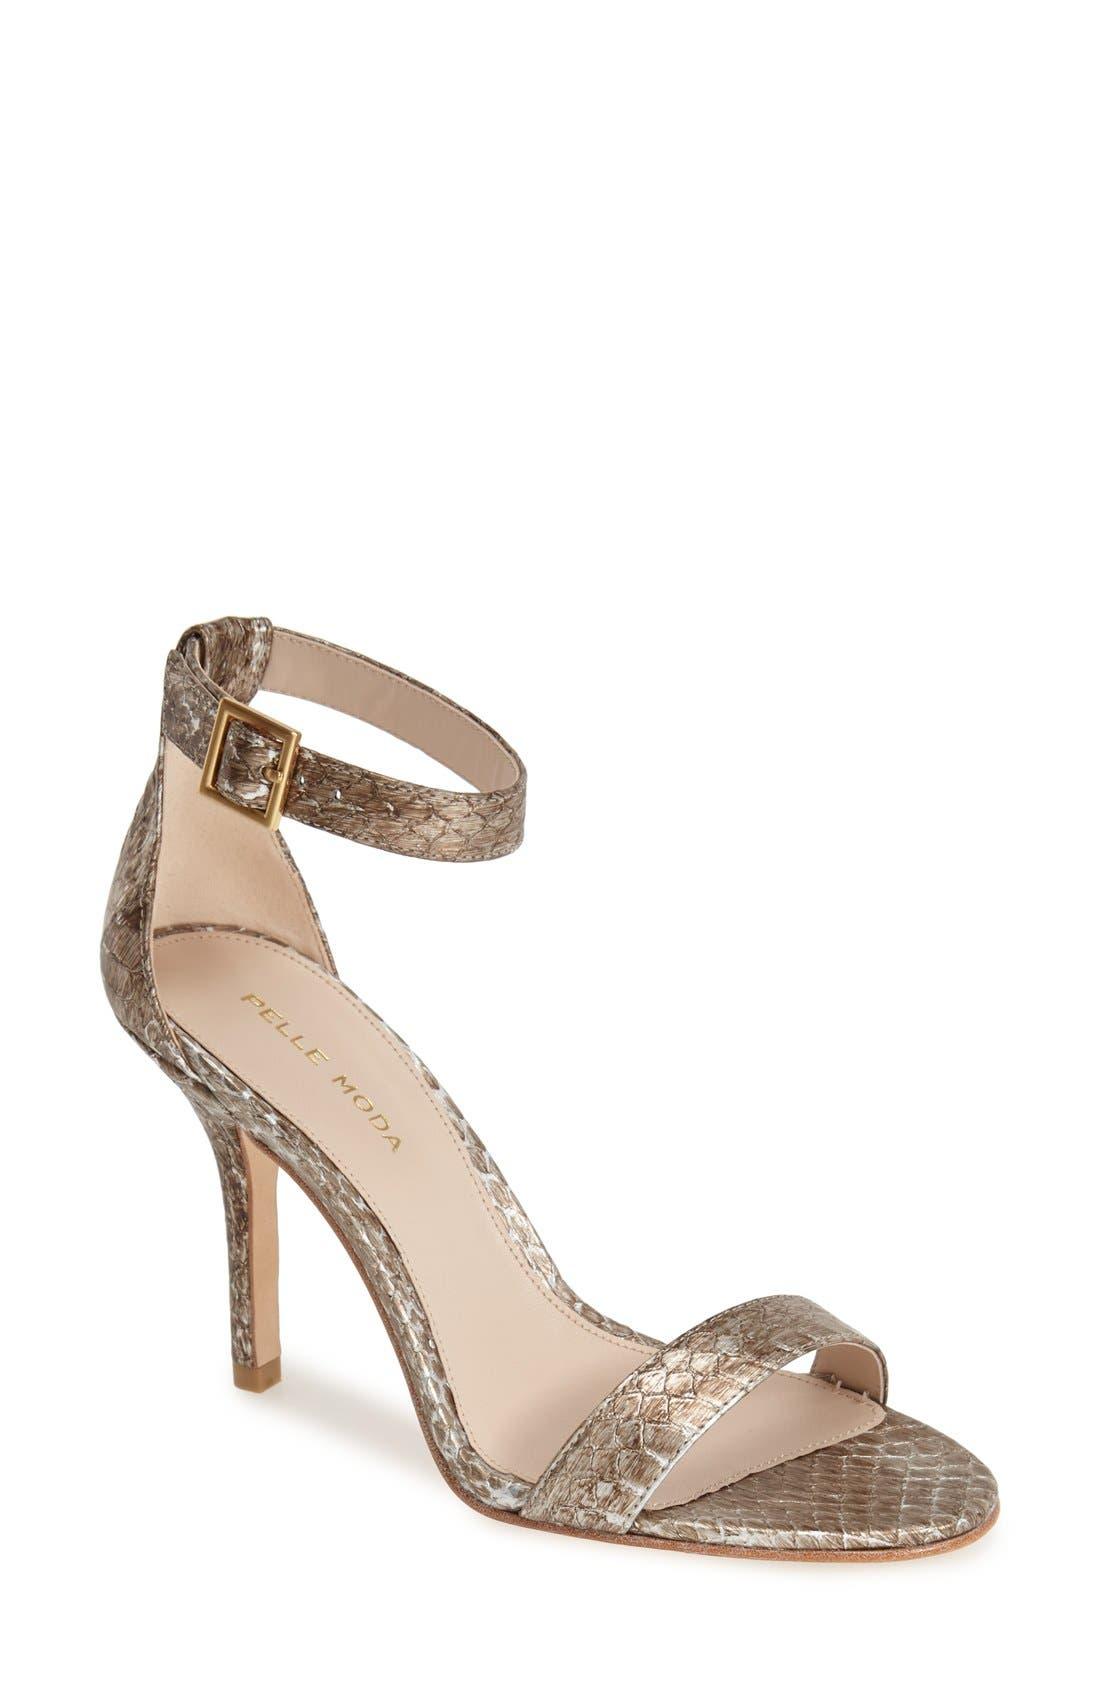 Main Image - Pelle Moda 'Kacey' Sandal